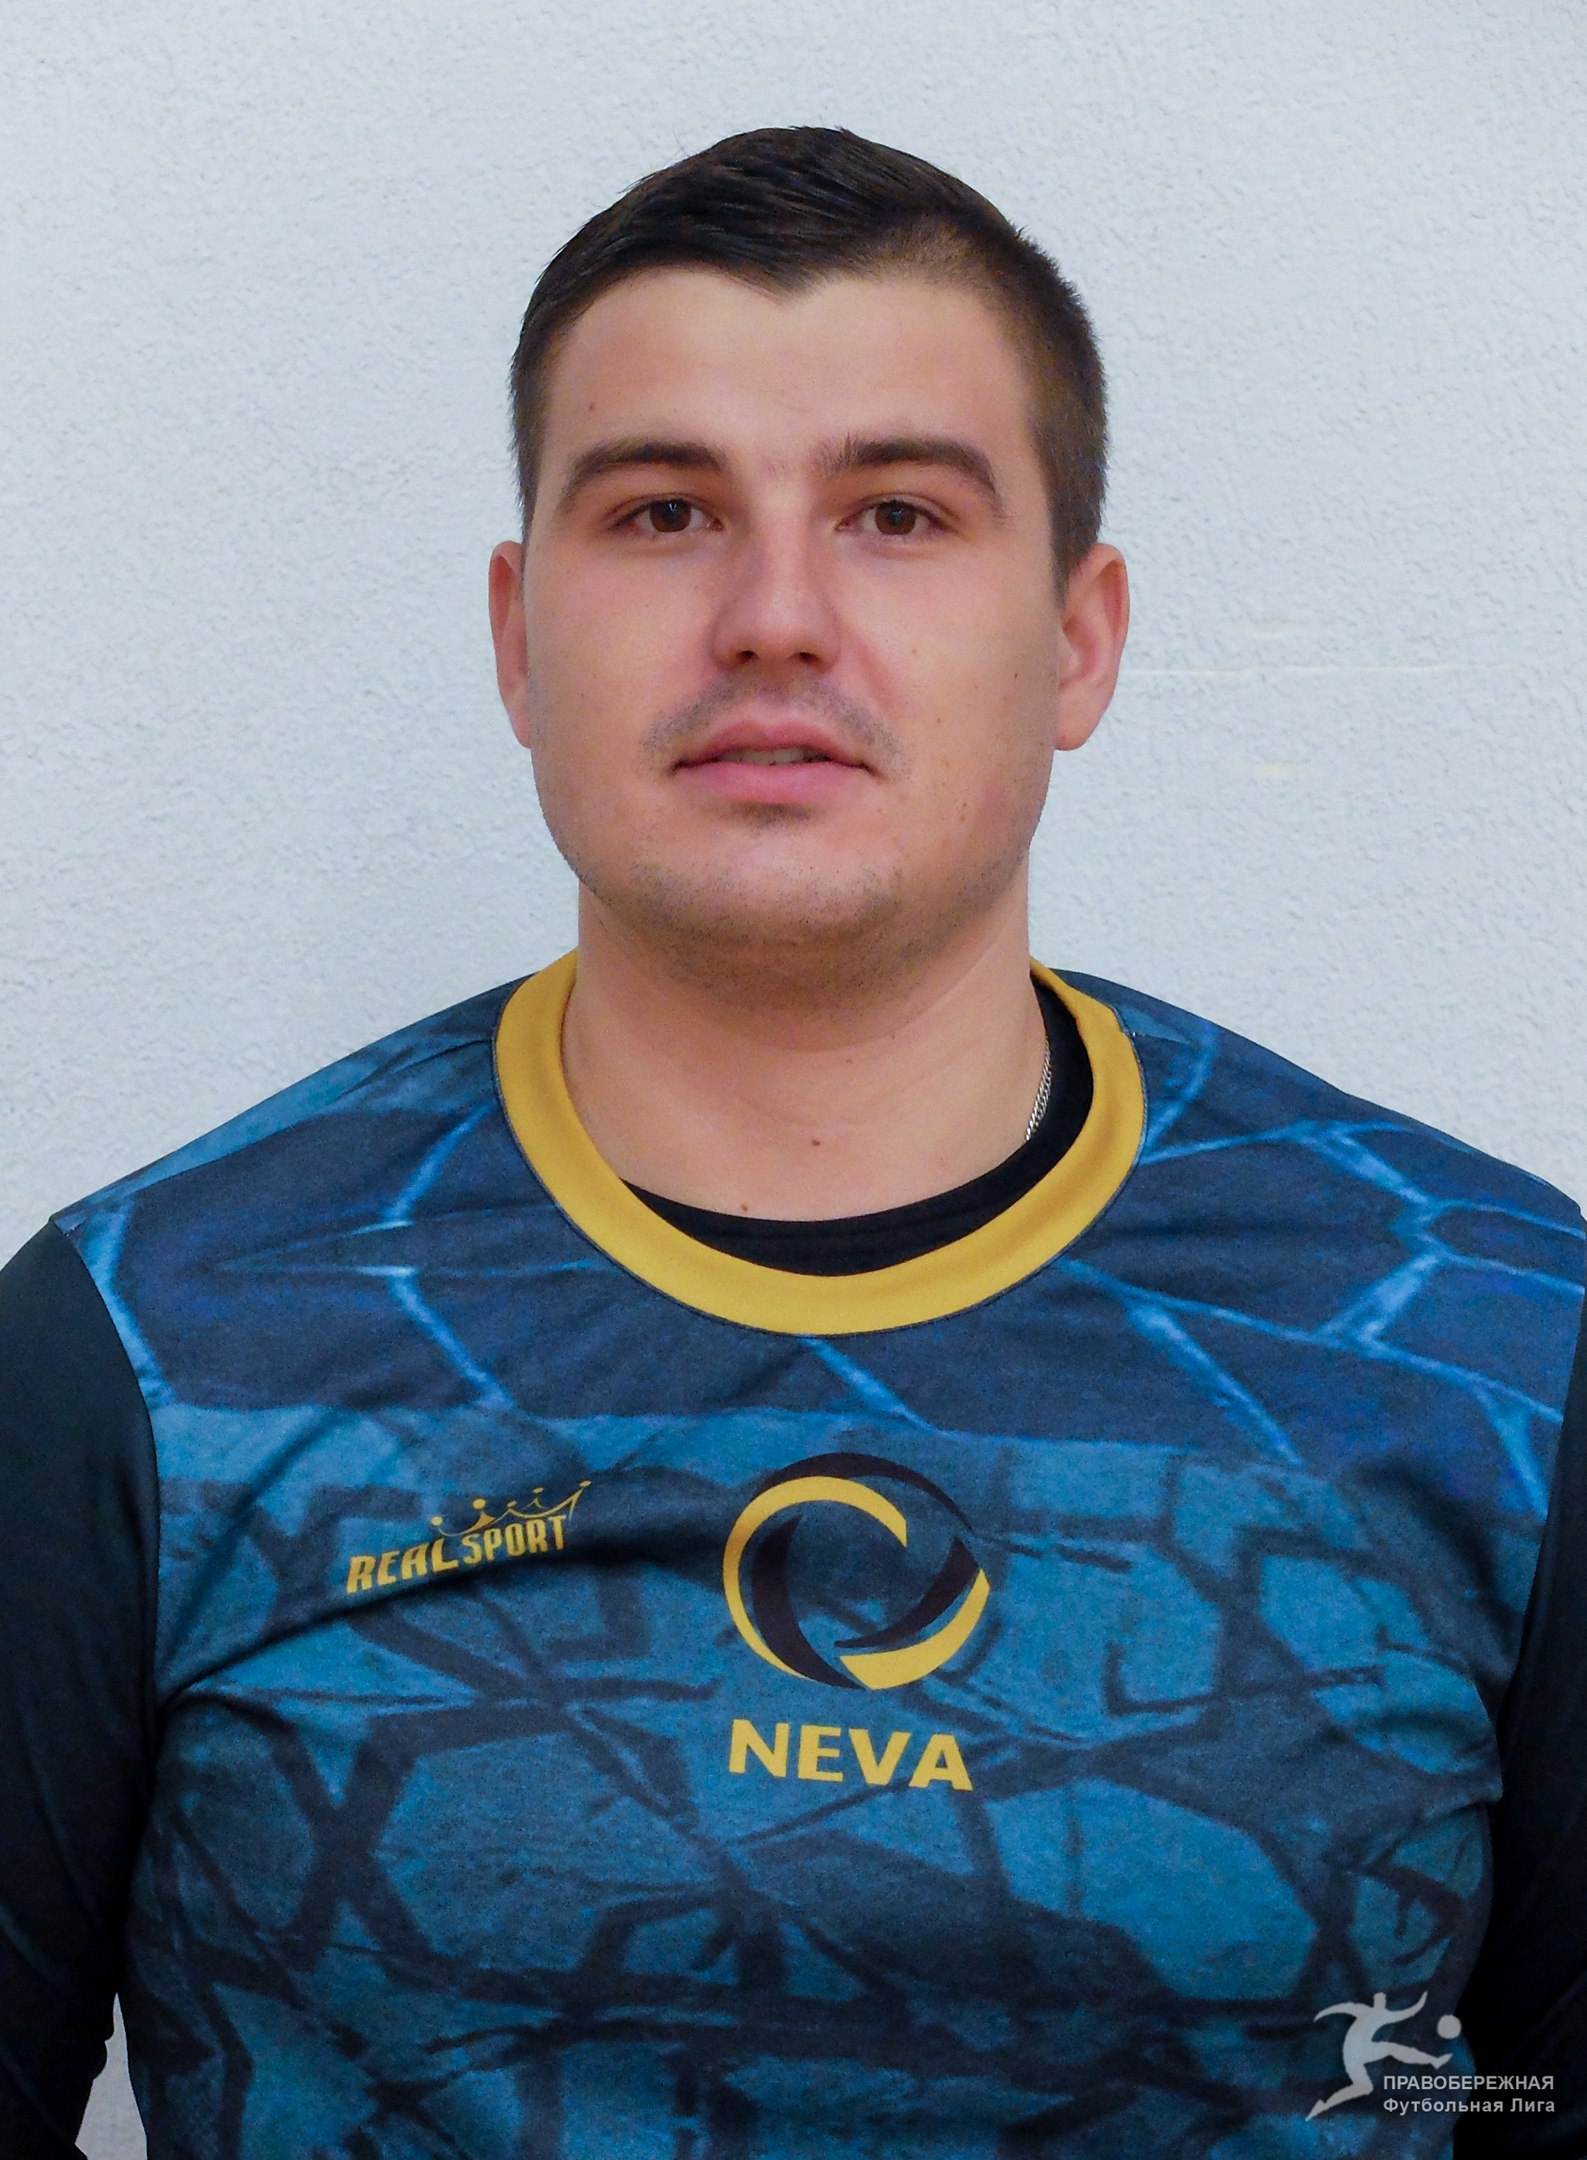 Банденков Дмитрий